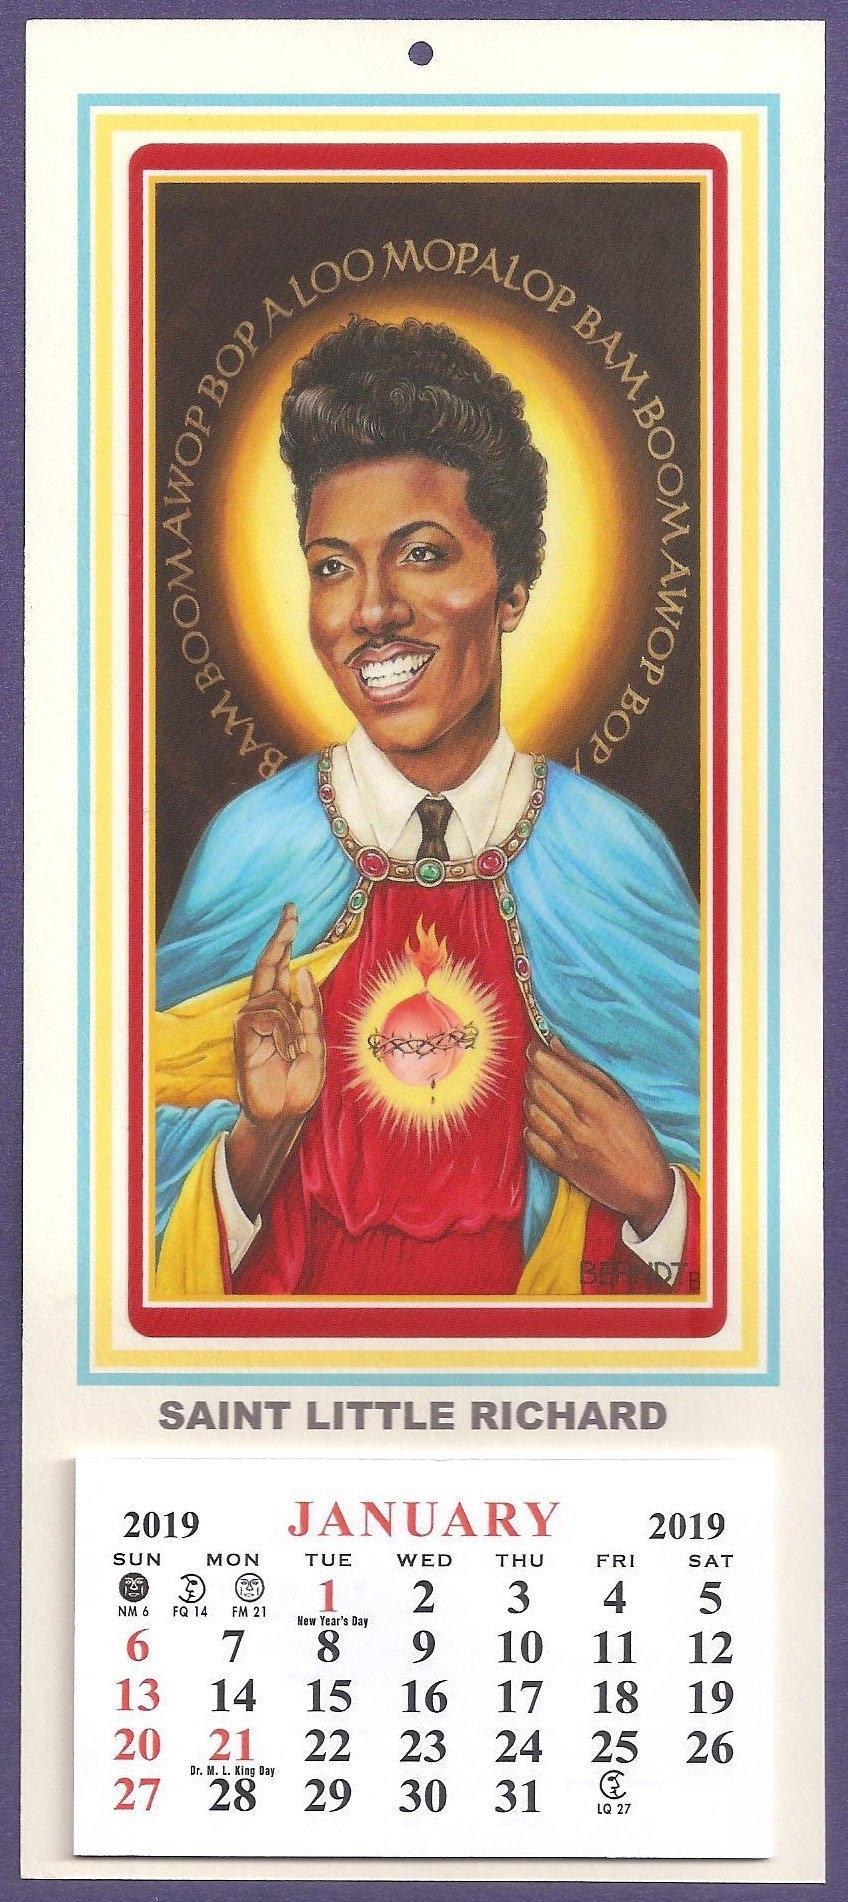 Little Richard, Patron Saint Of Rock 'n' Roll 2020 Calendar For Route 66!